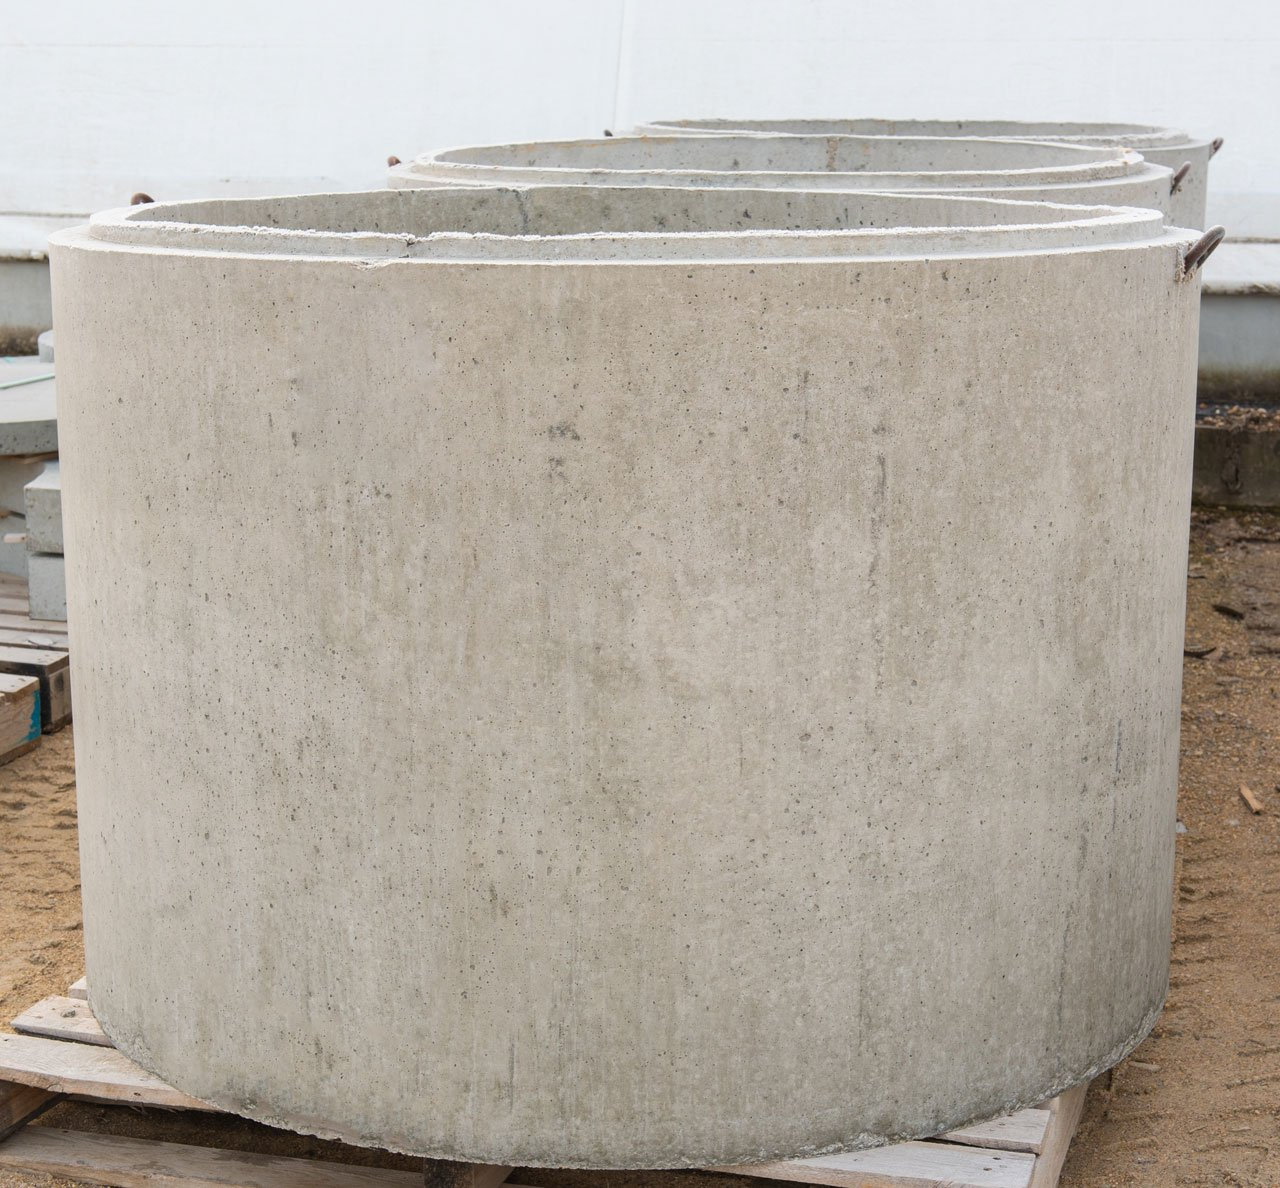 4 foot diameter x 36 inch well cribbing